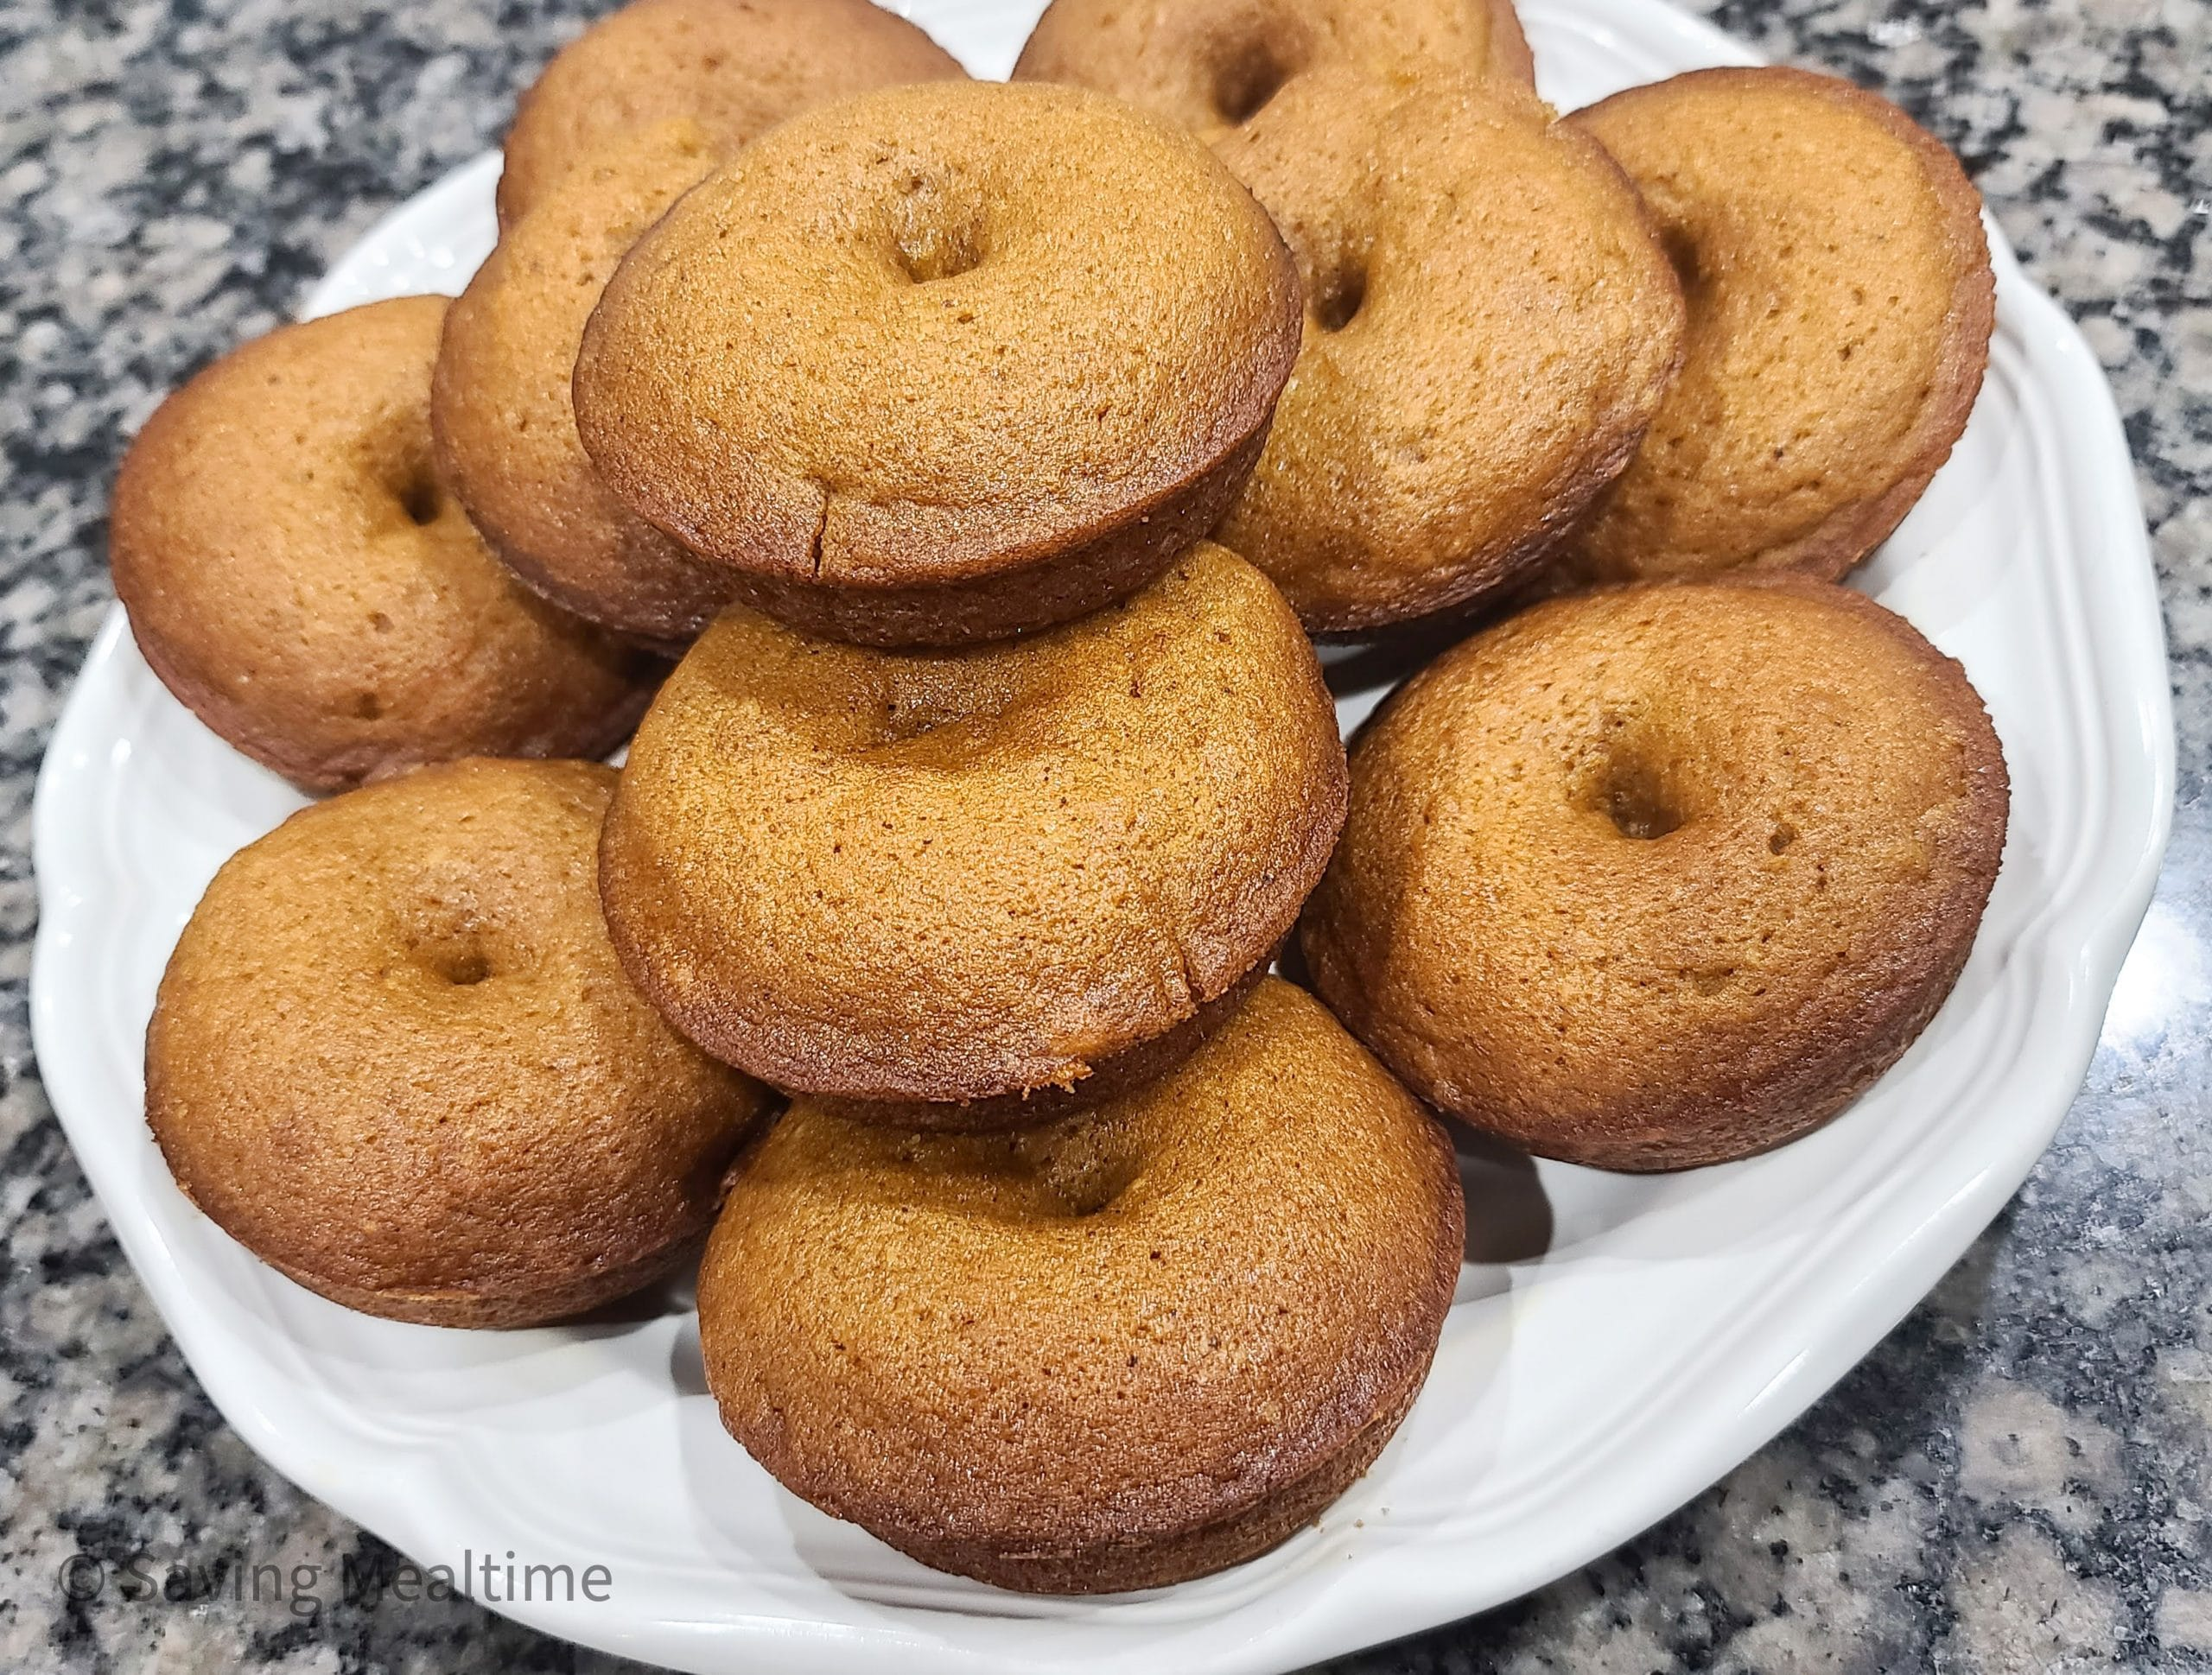 Baked Pumpkin Donuts with Powdered Sugar